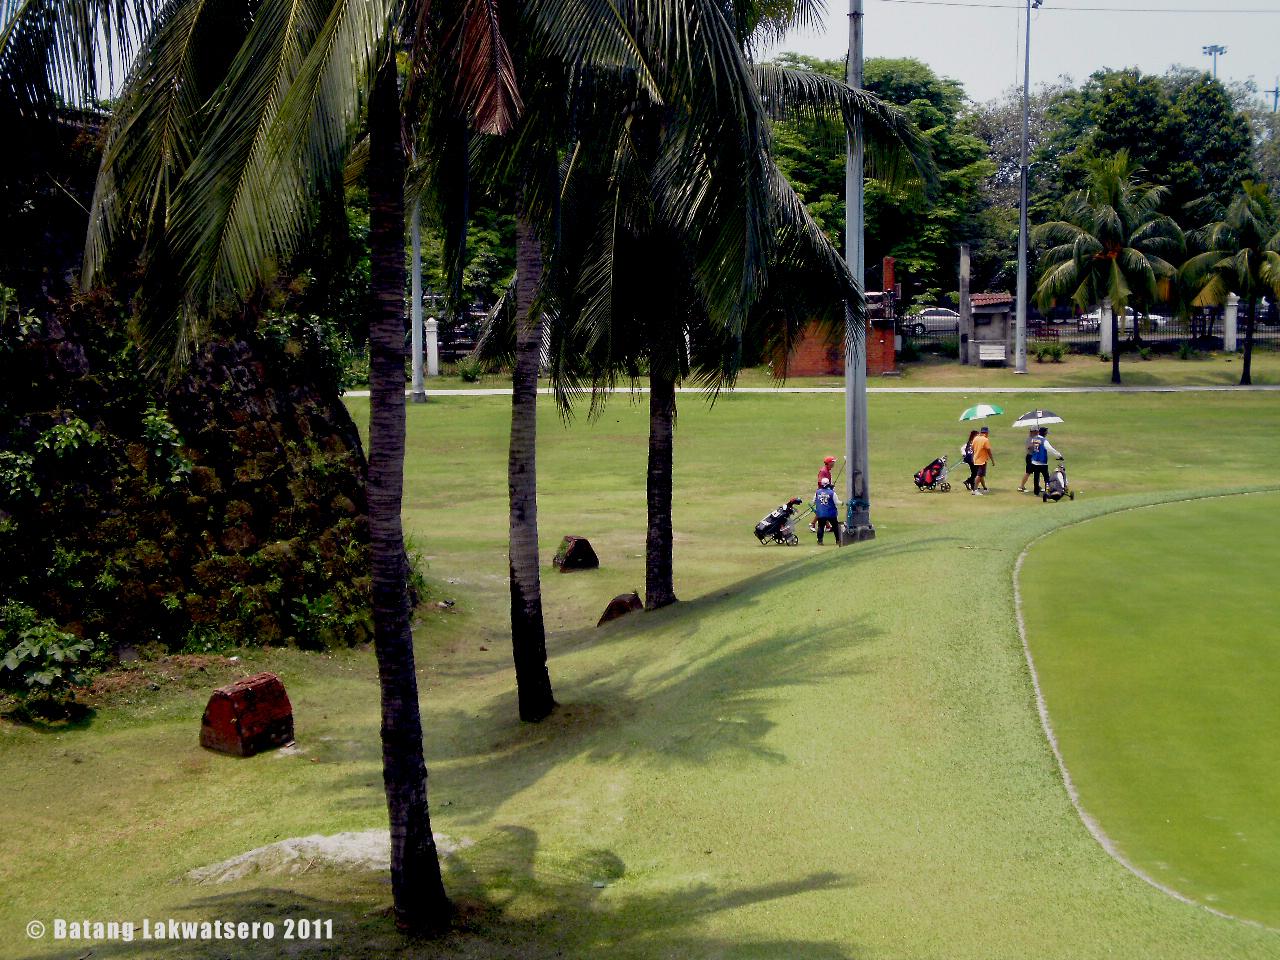 Walktour in Manila | Intramuros For Free